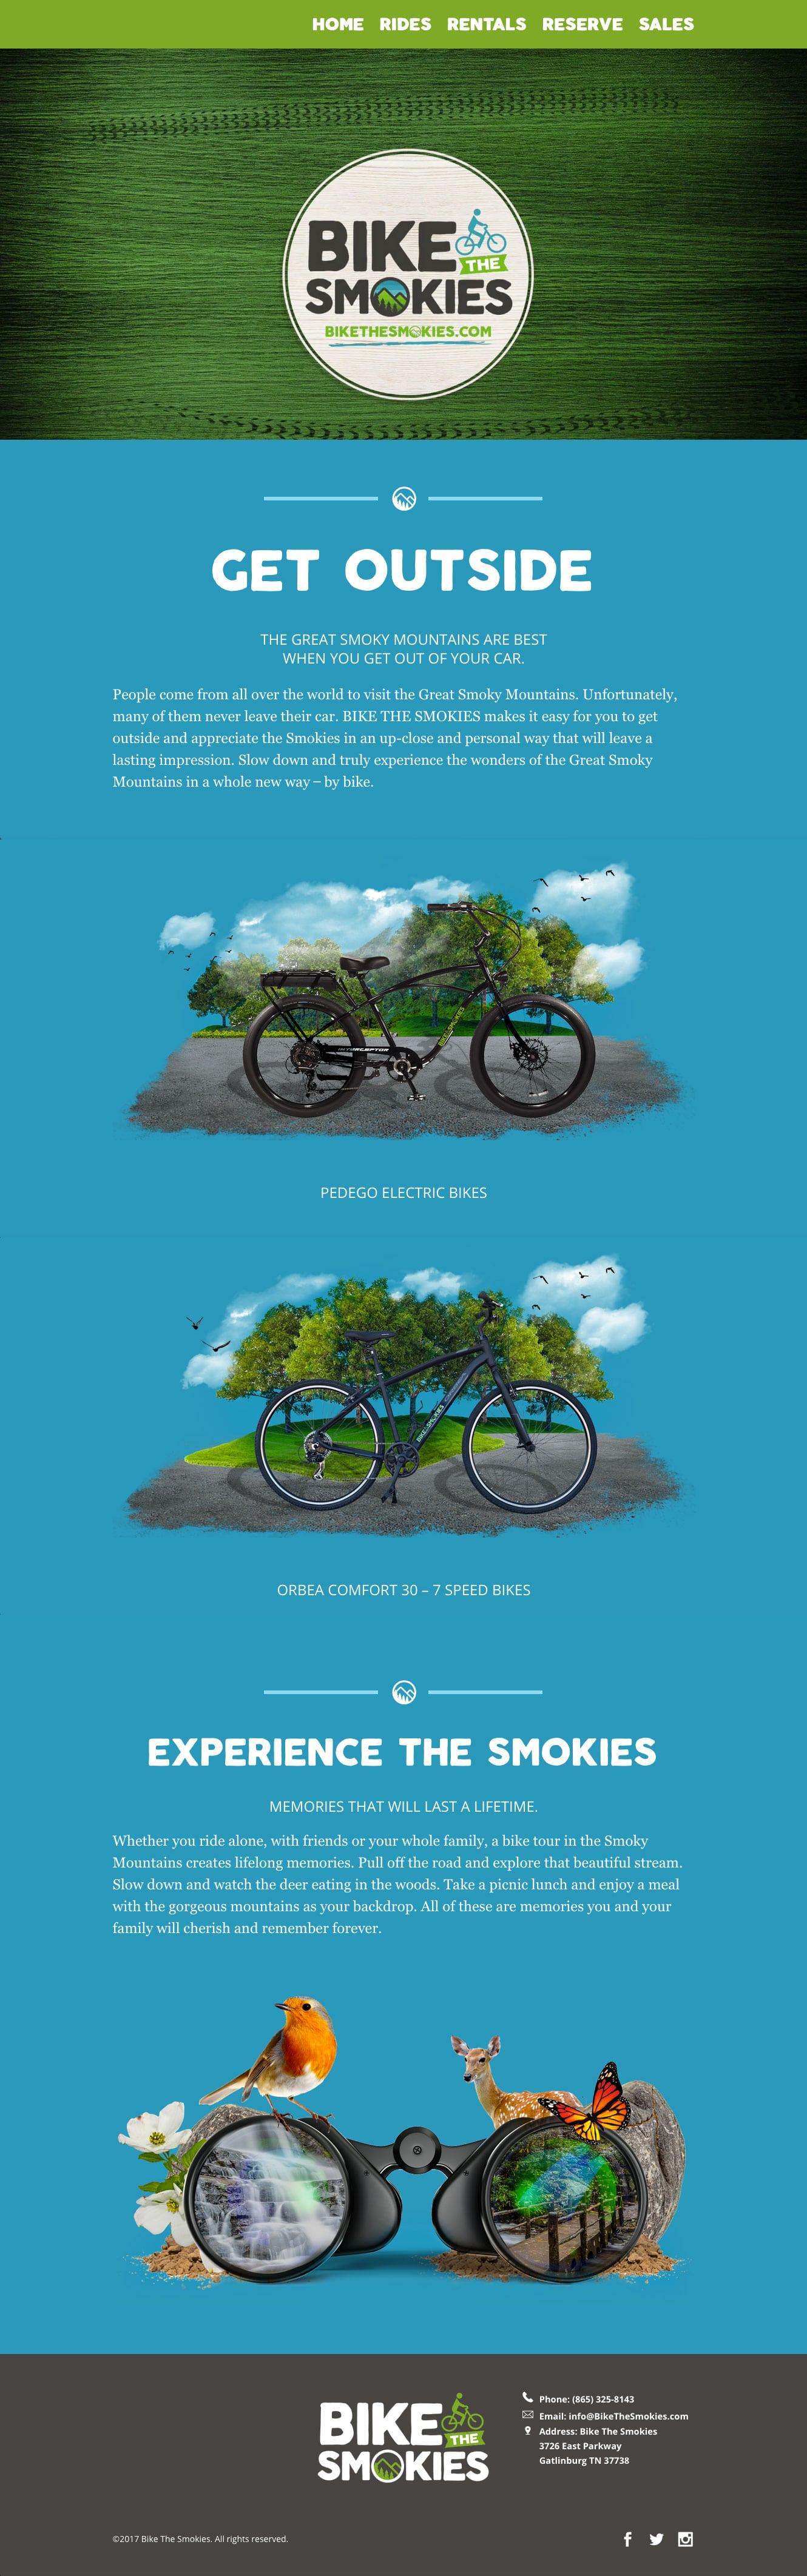 bikethesmokies